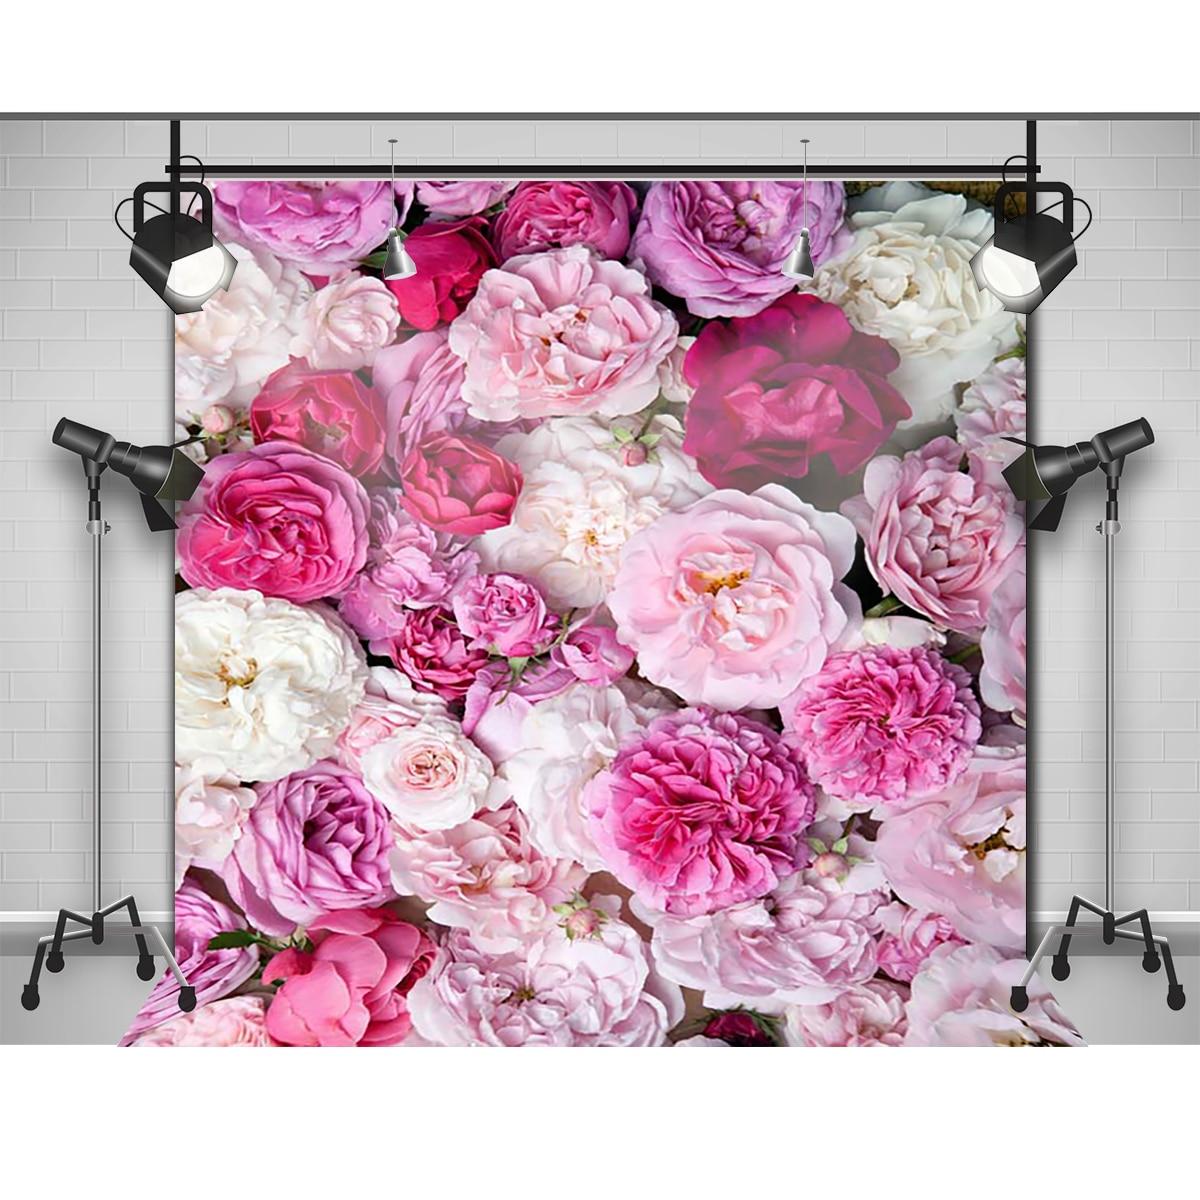 Allenjoy Photographic Background Pink Flowers Red Peony Newborn